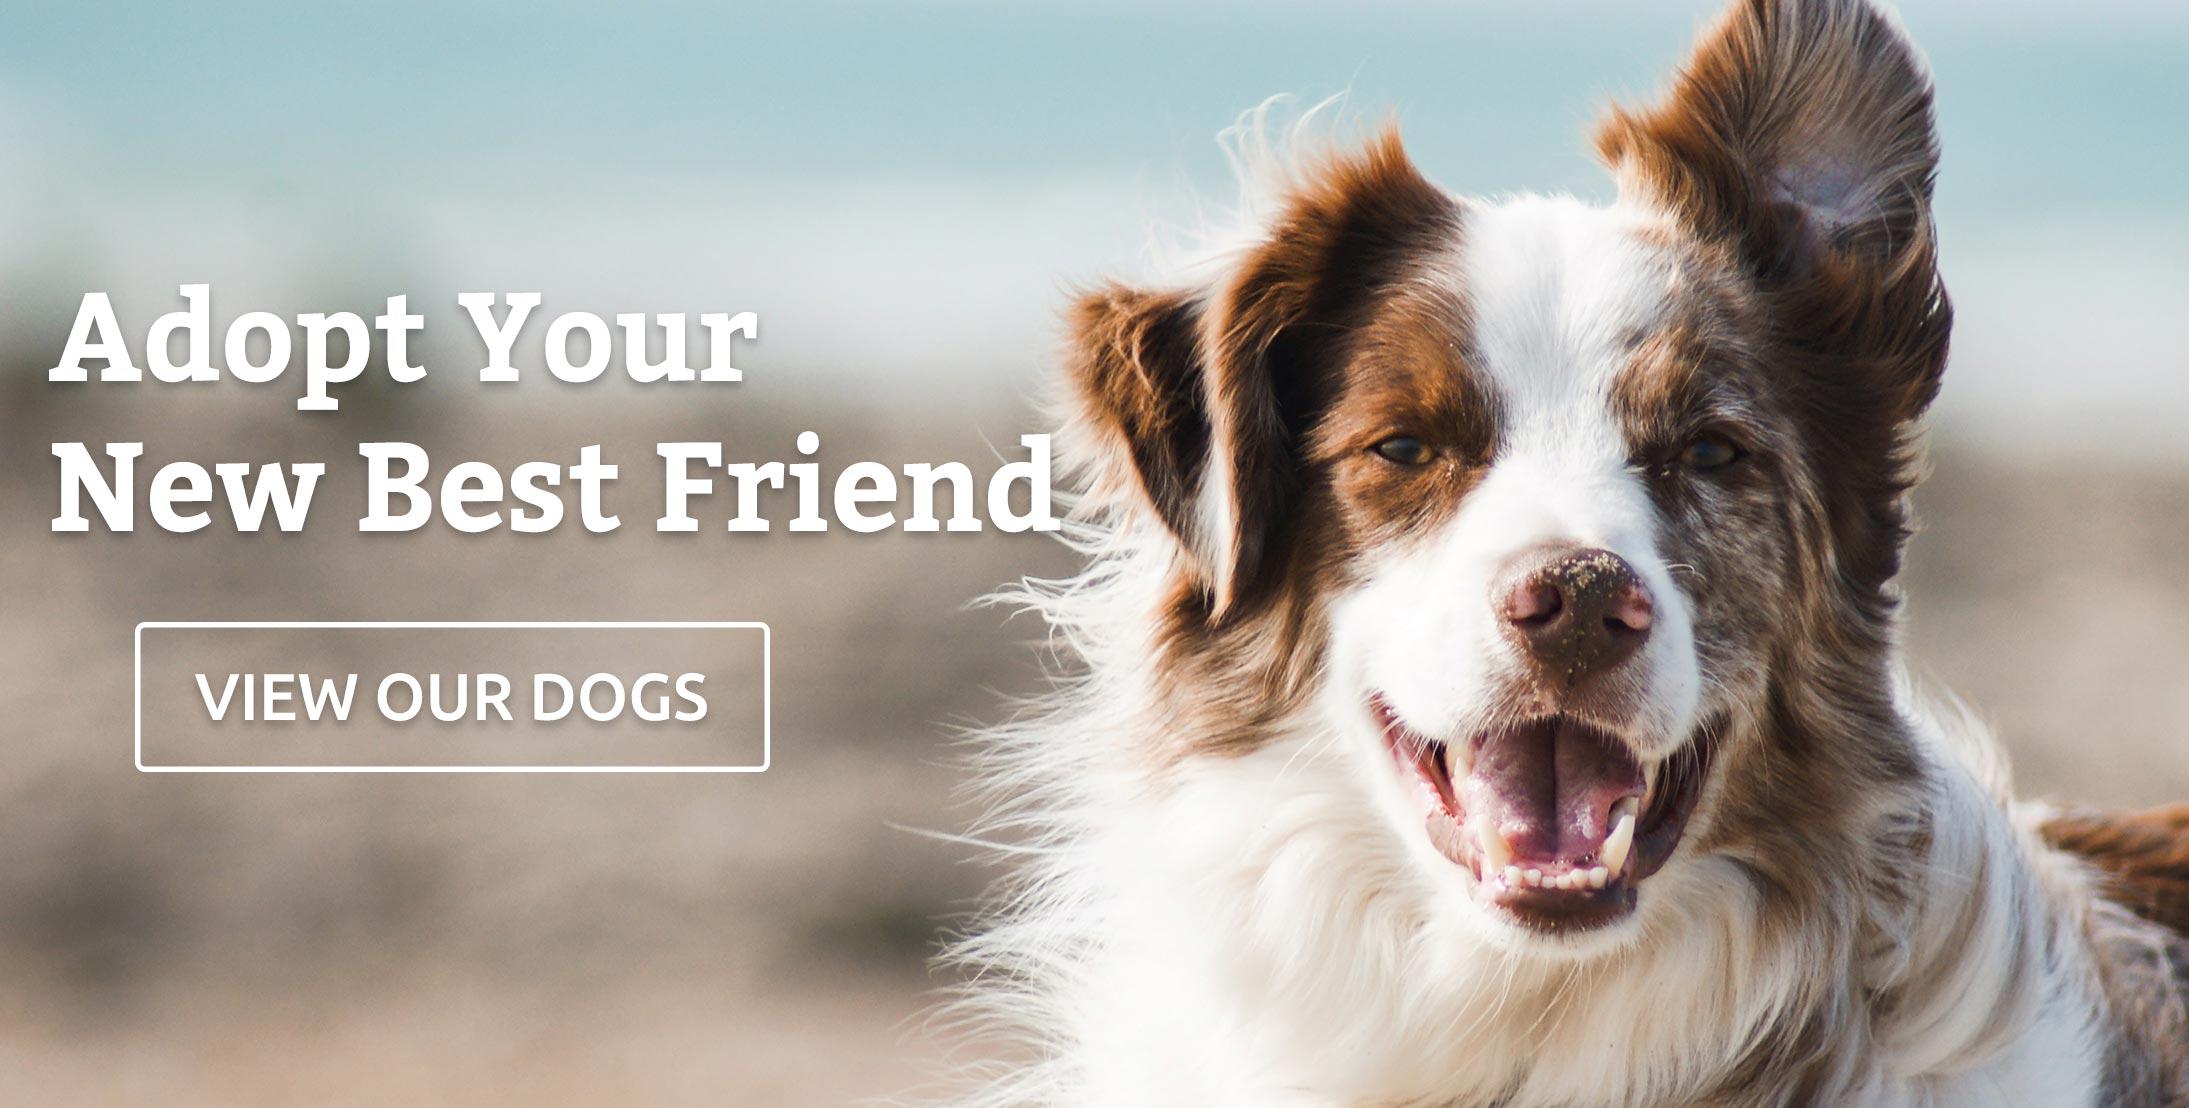 Adopt your new best friend